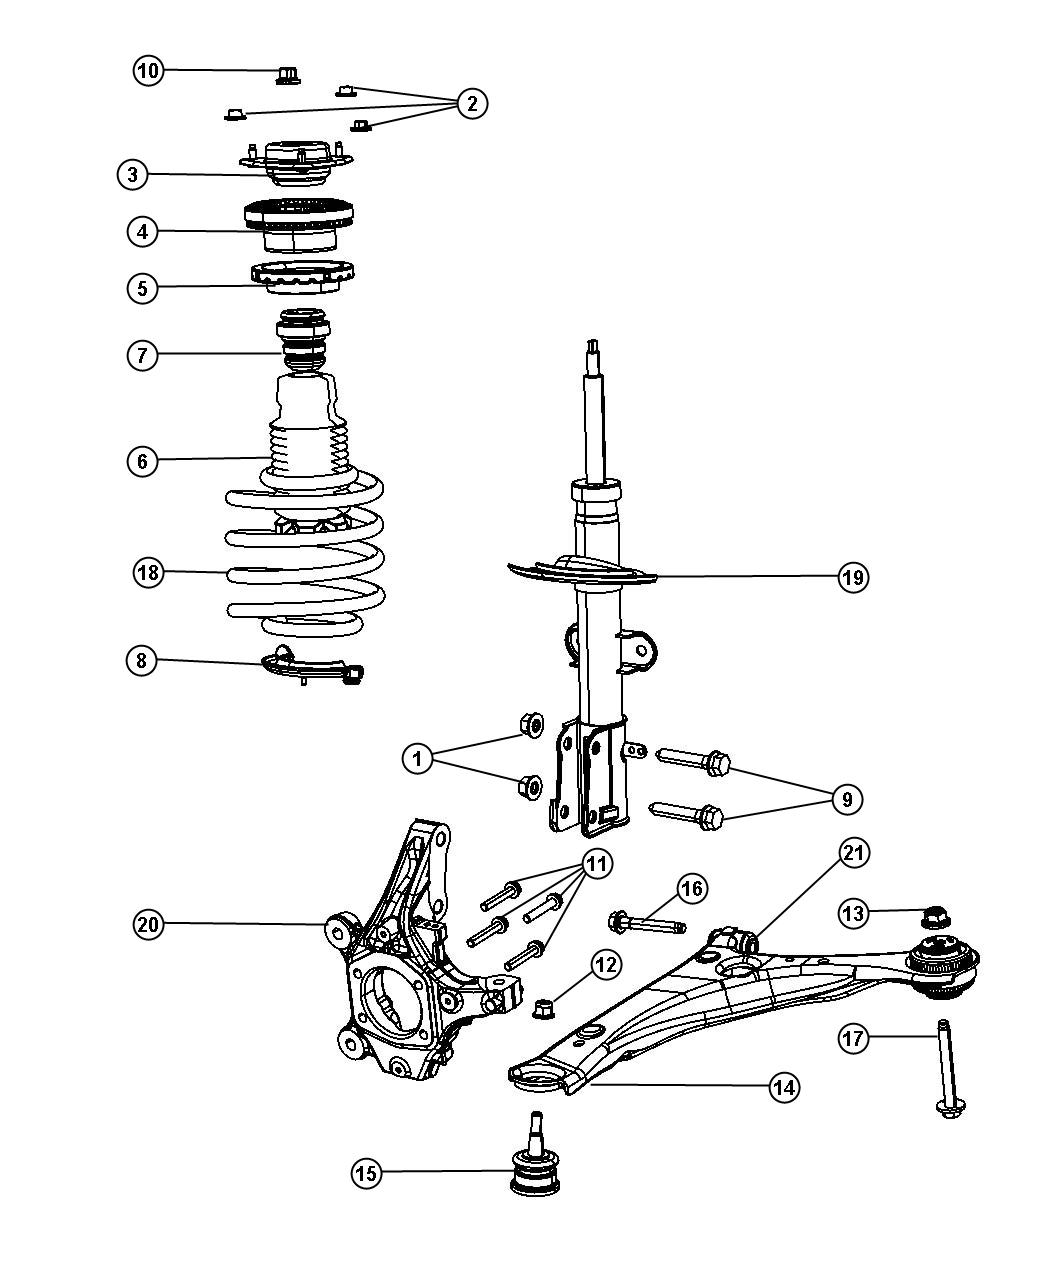 2002 Dodge Caravan Suspension Diagram